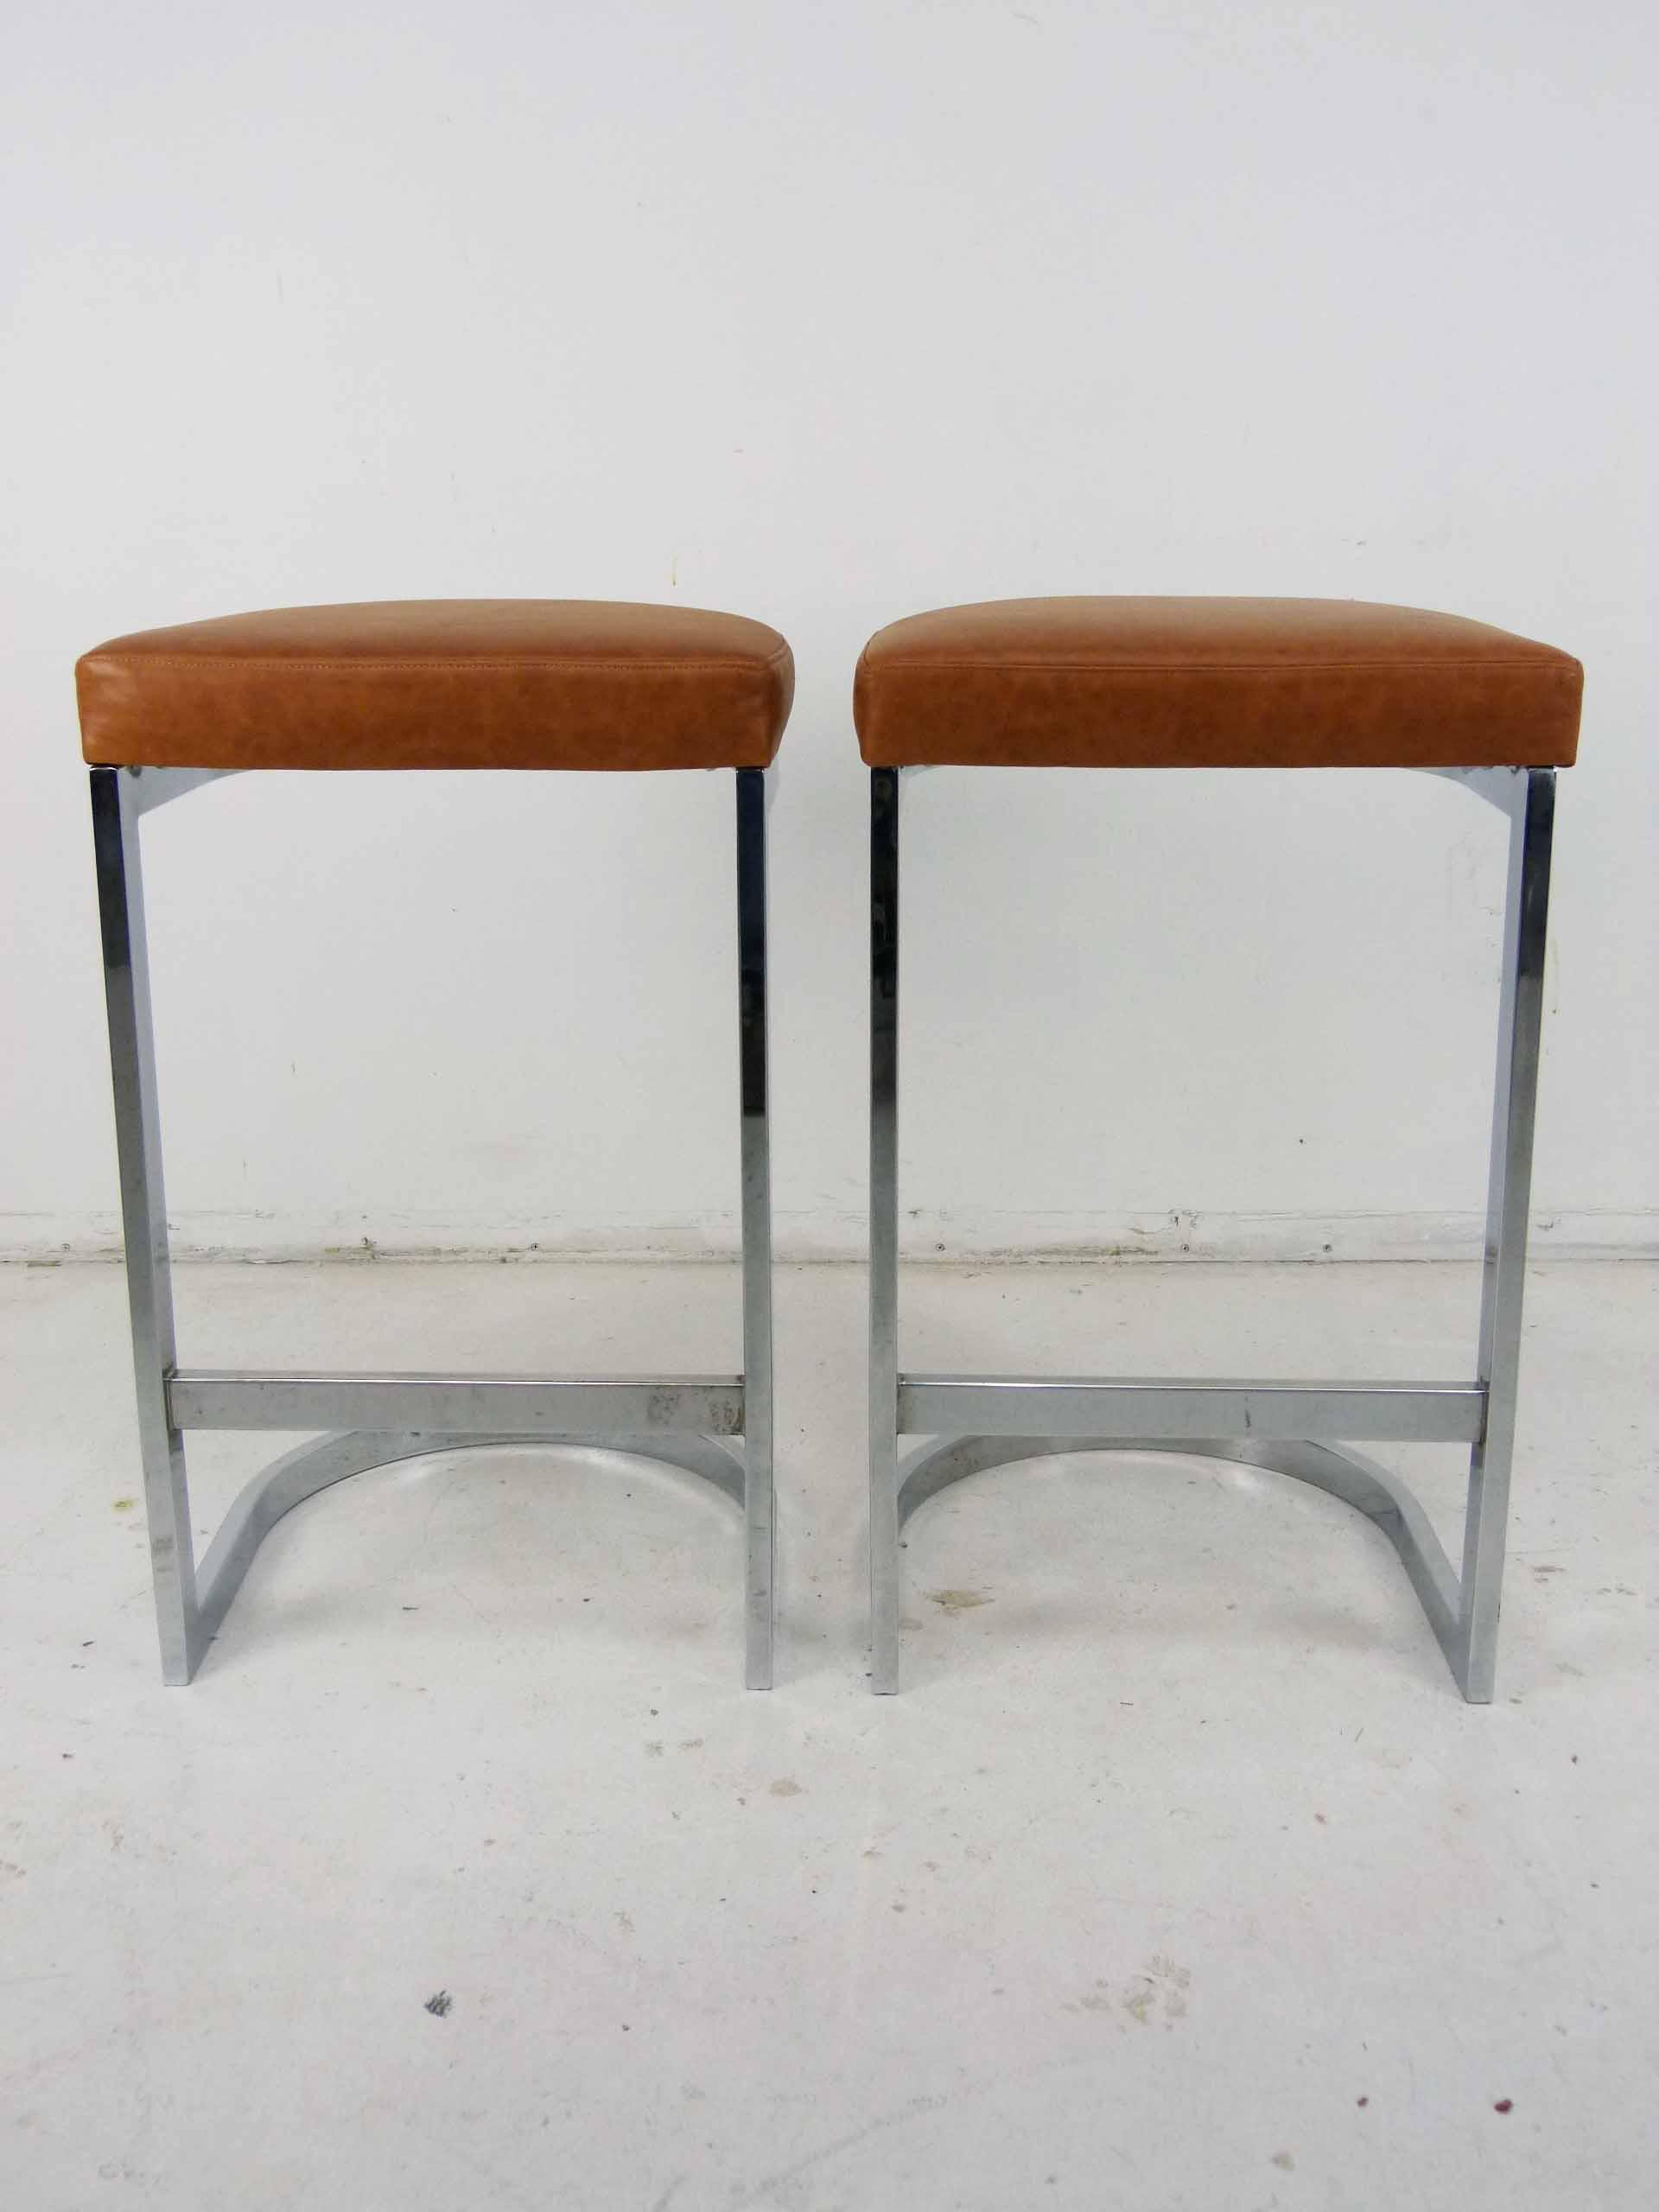 Milo Baughman Style Flat Bar Chrome Cantilever Bar Stools